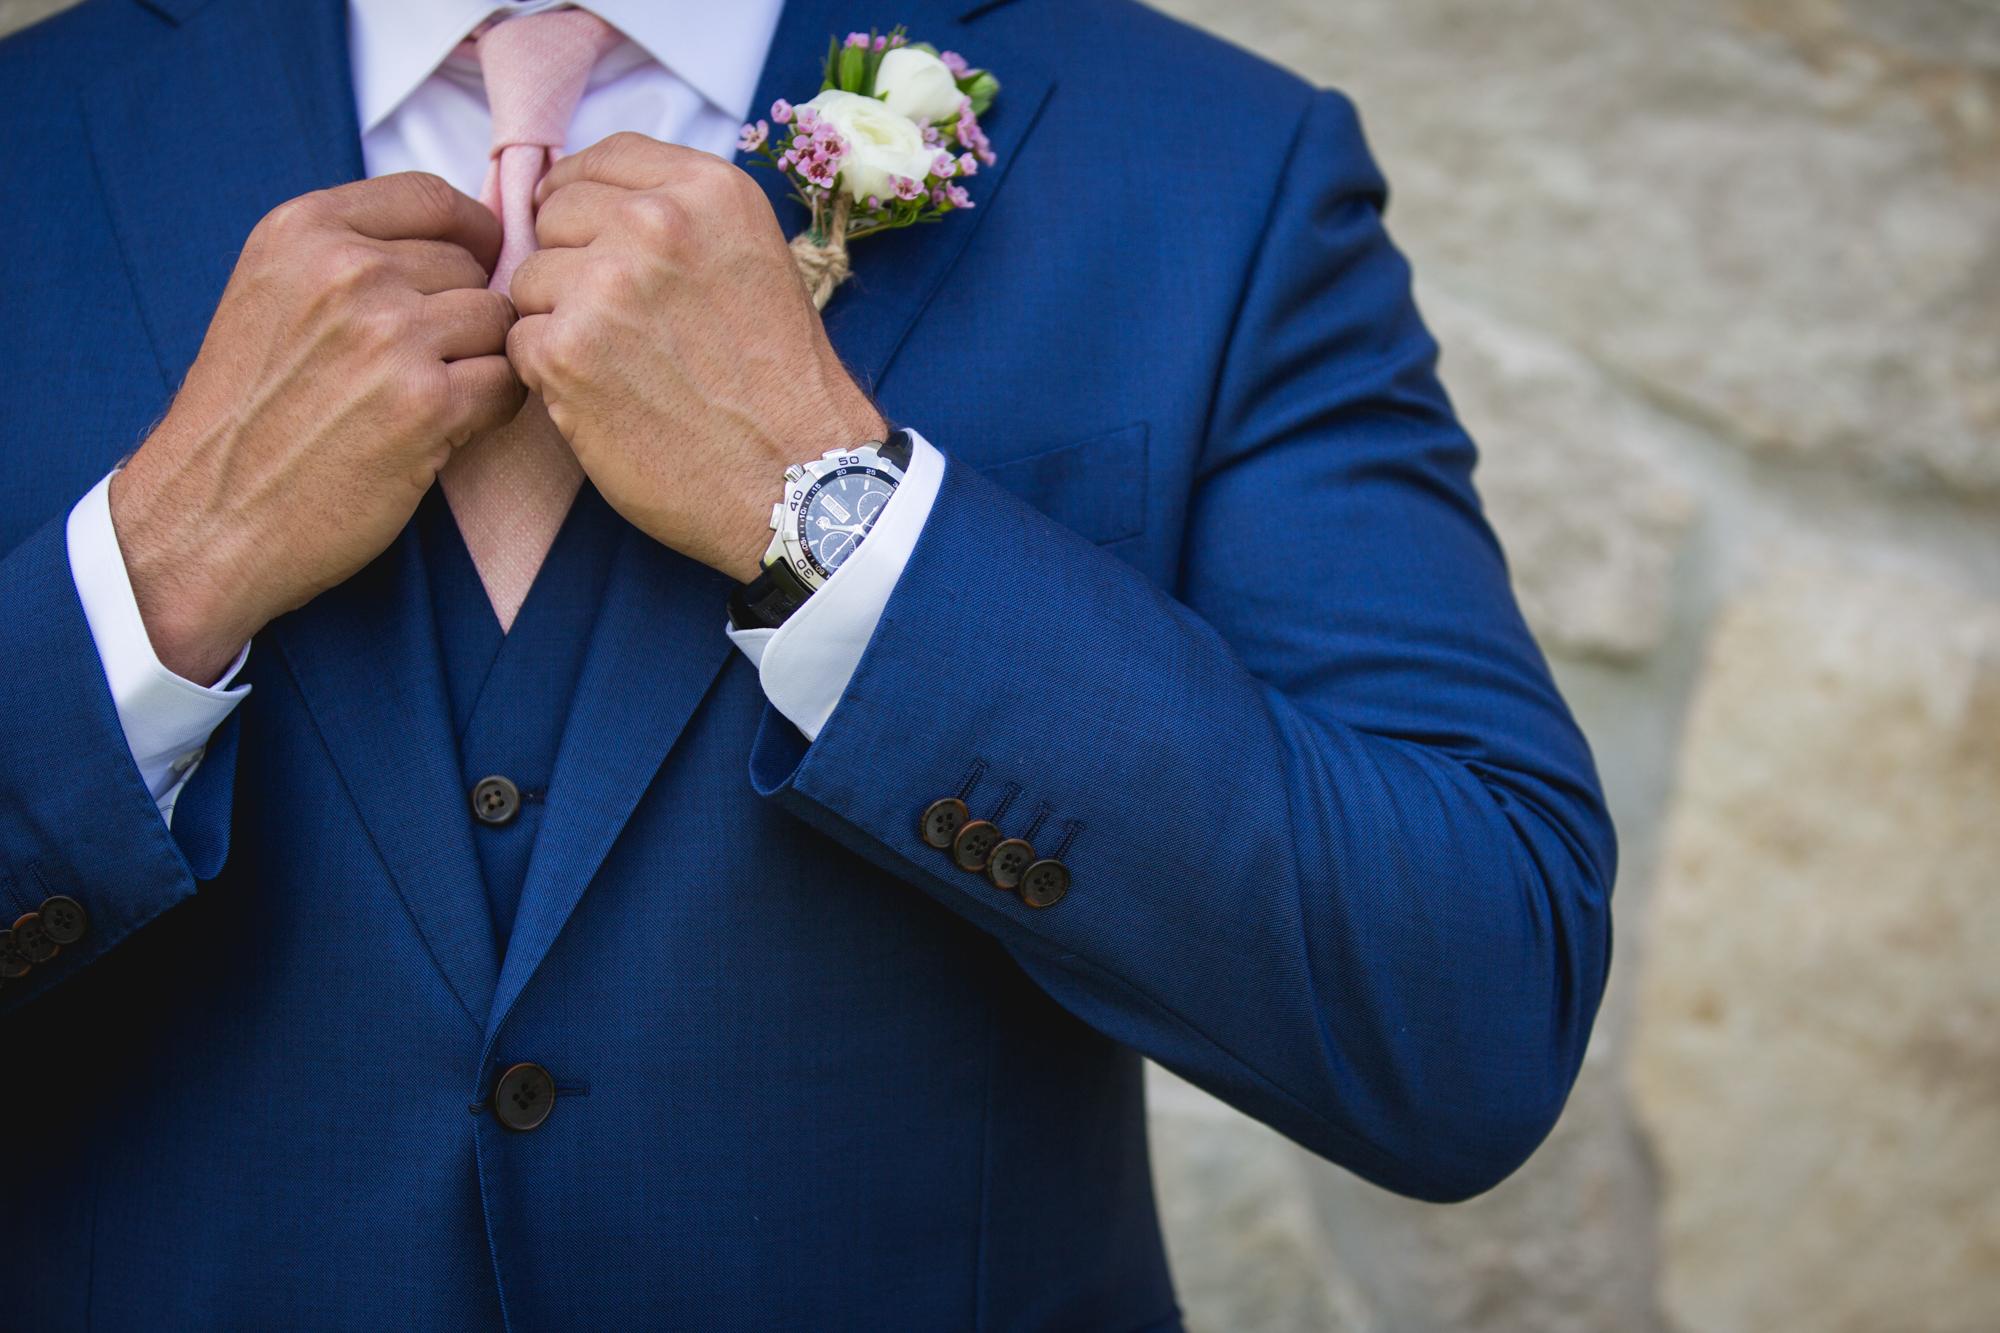 wedding photo Chicago